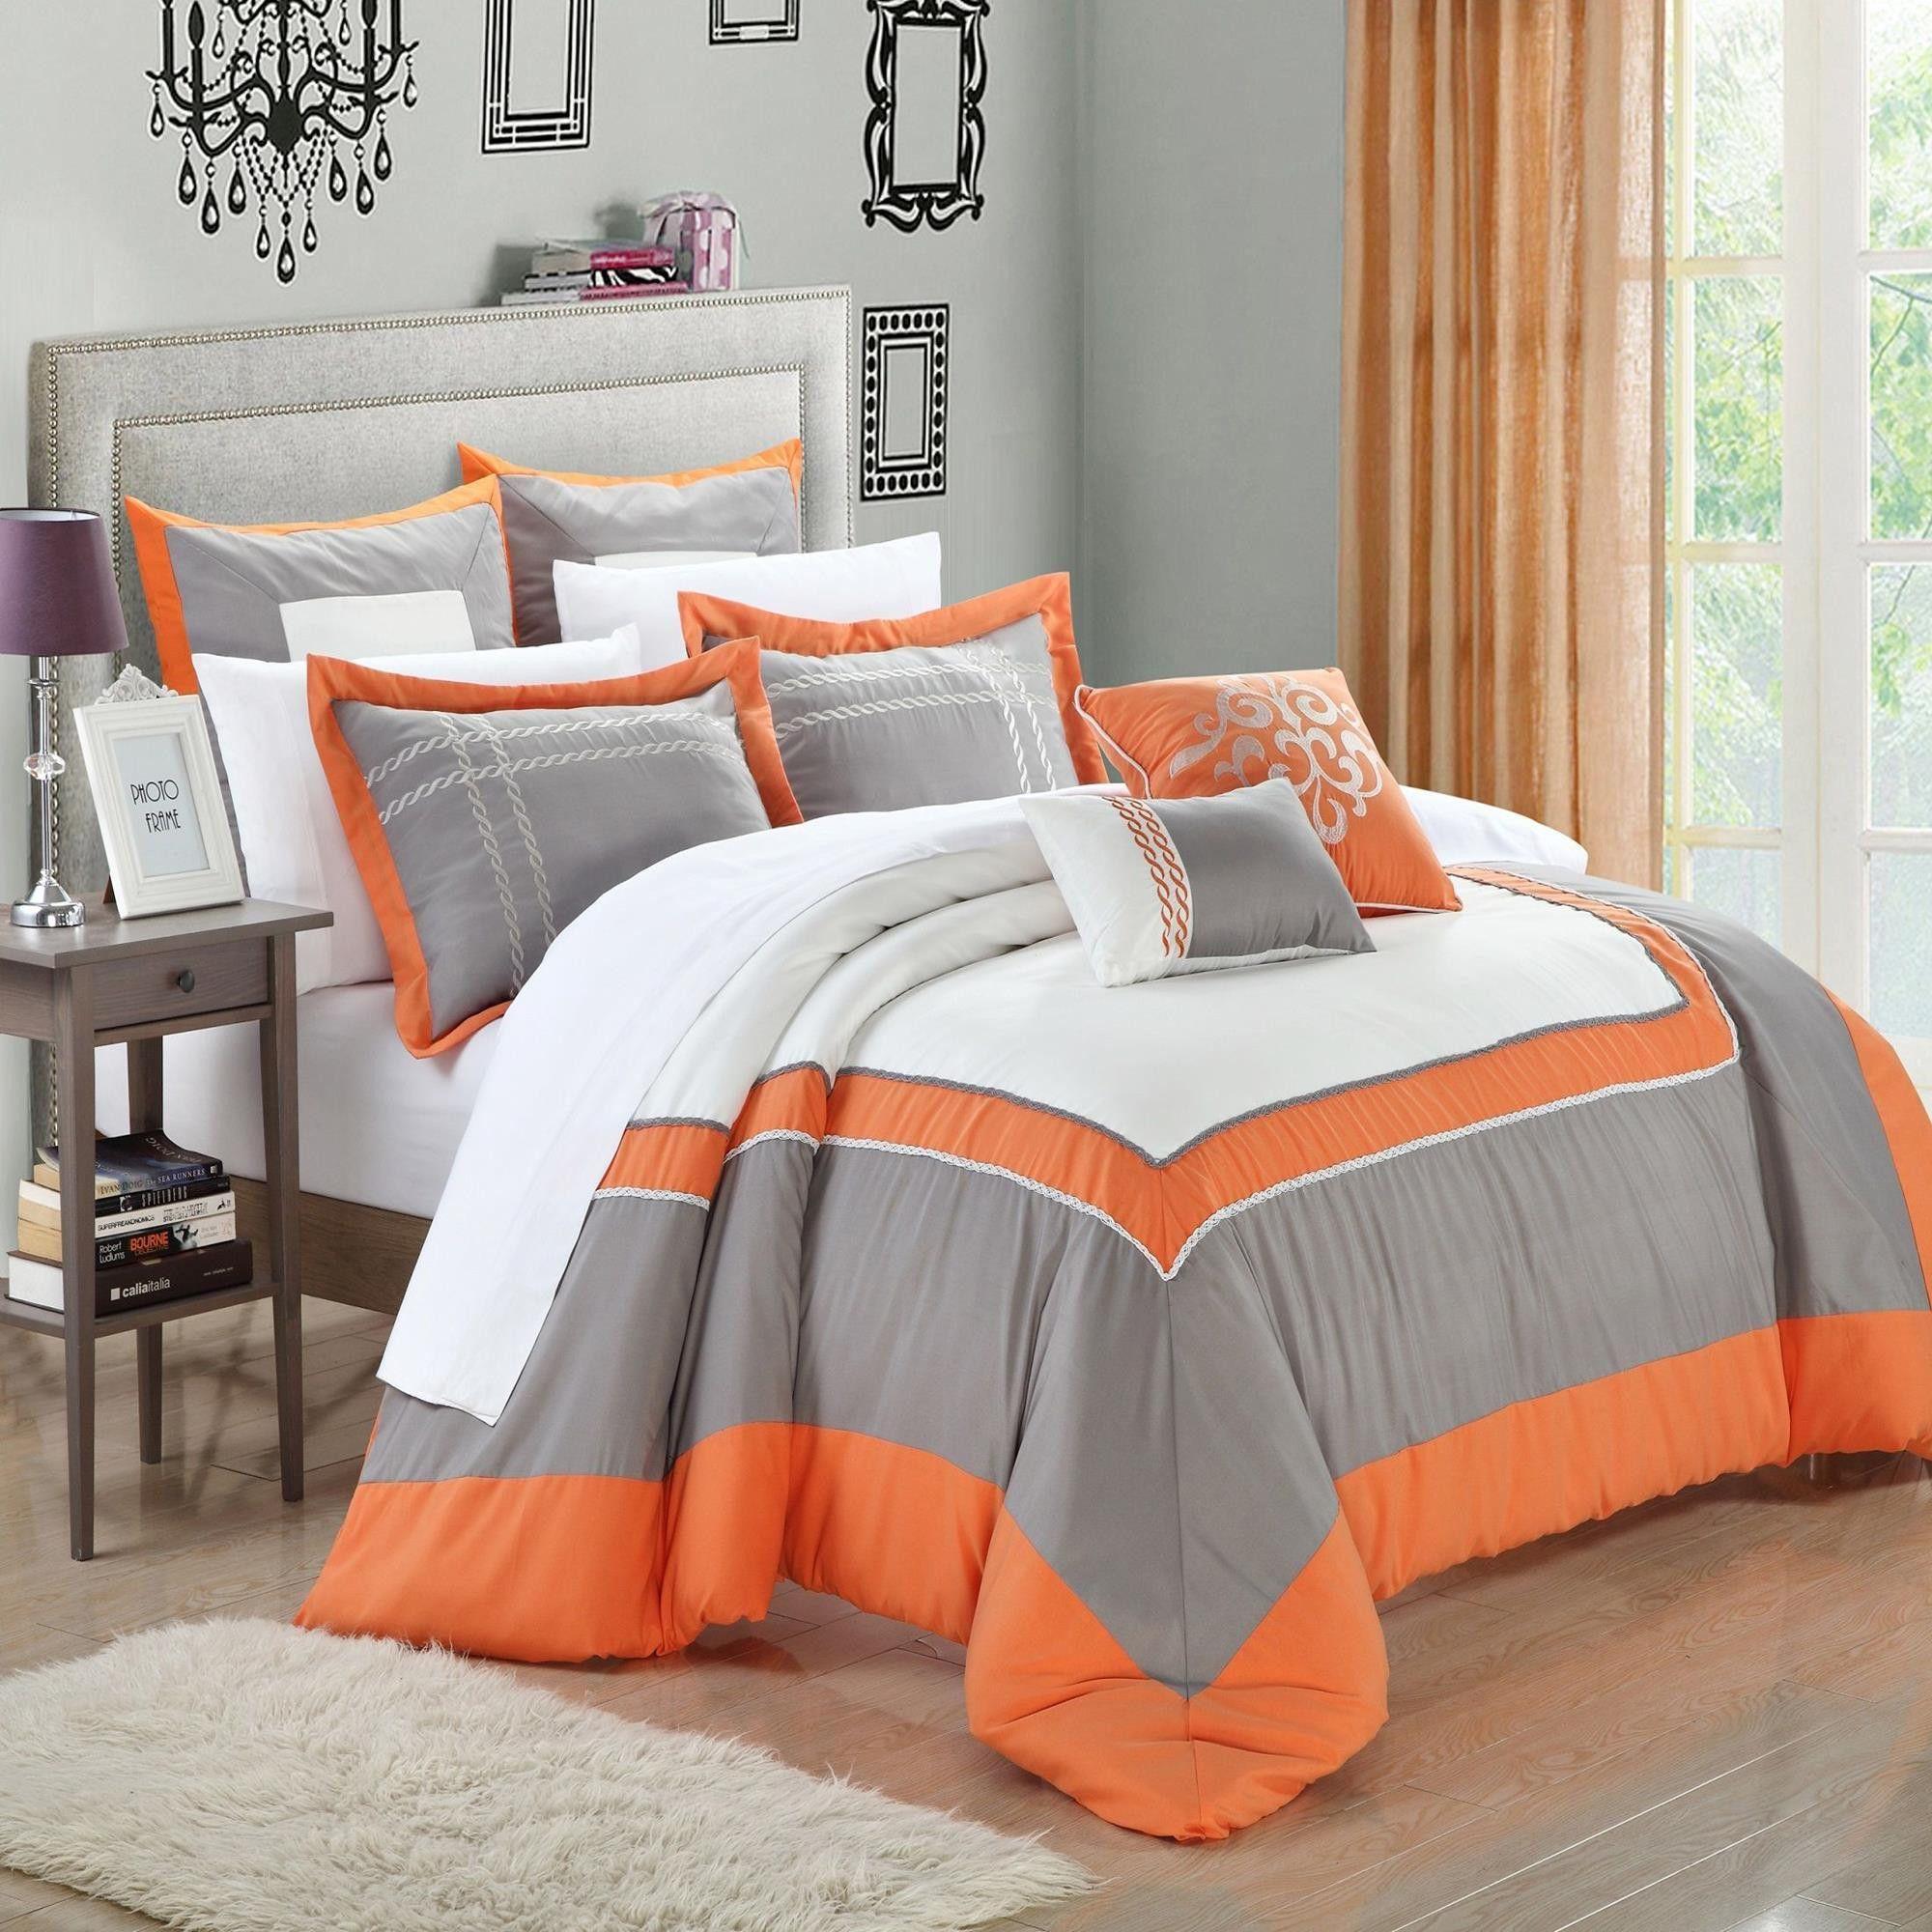 Ballroom Orange Grey White 7 Piece Comforter Bed In A Bag Set